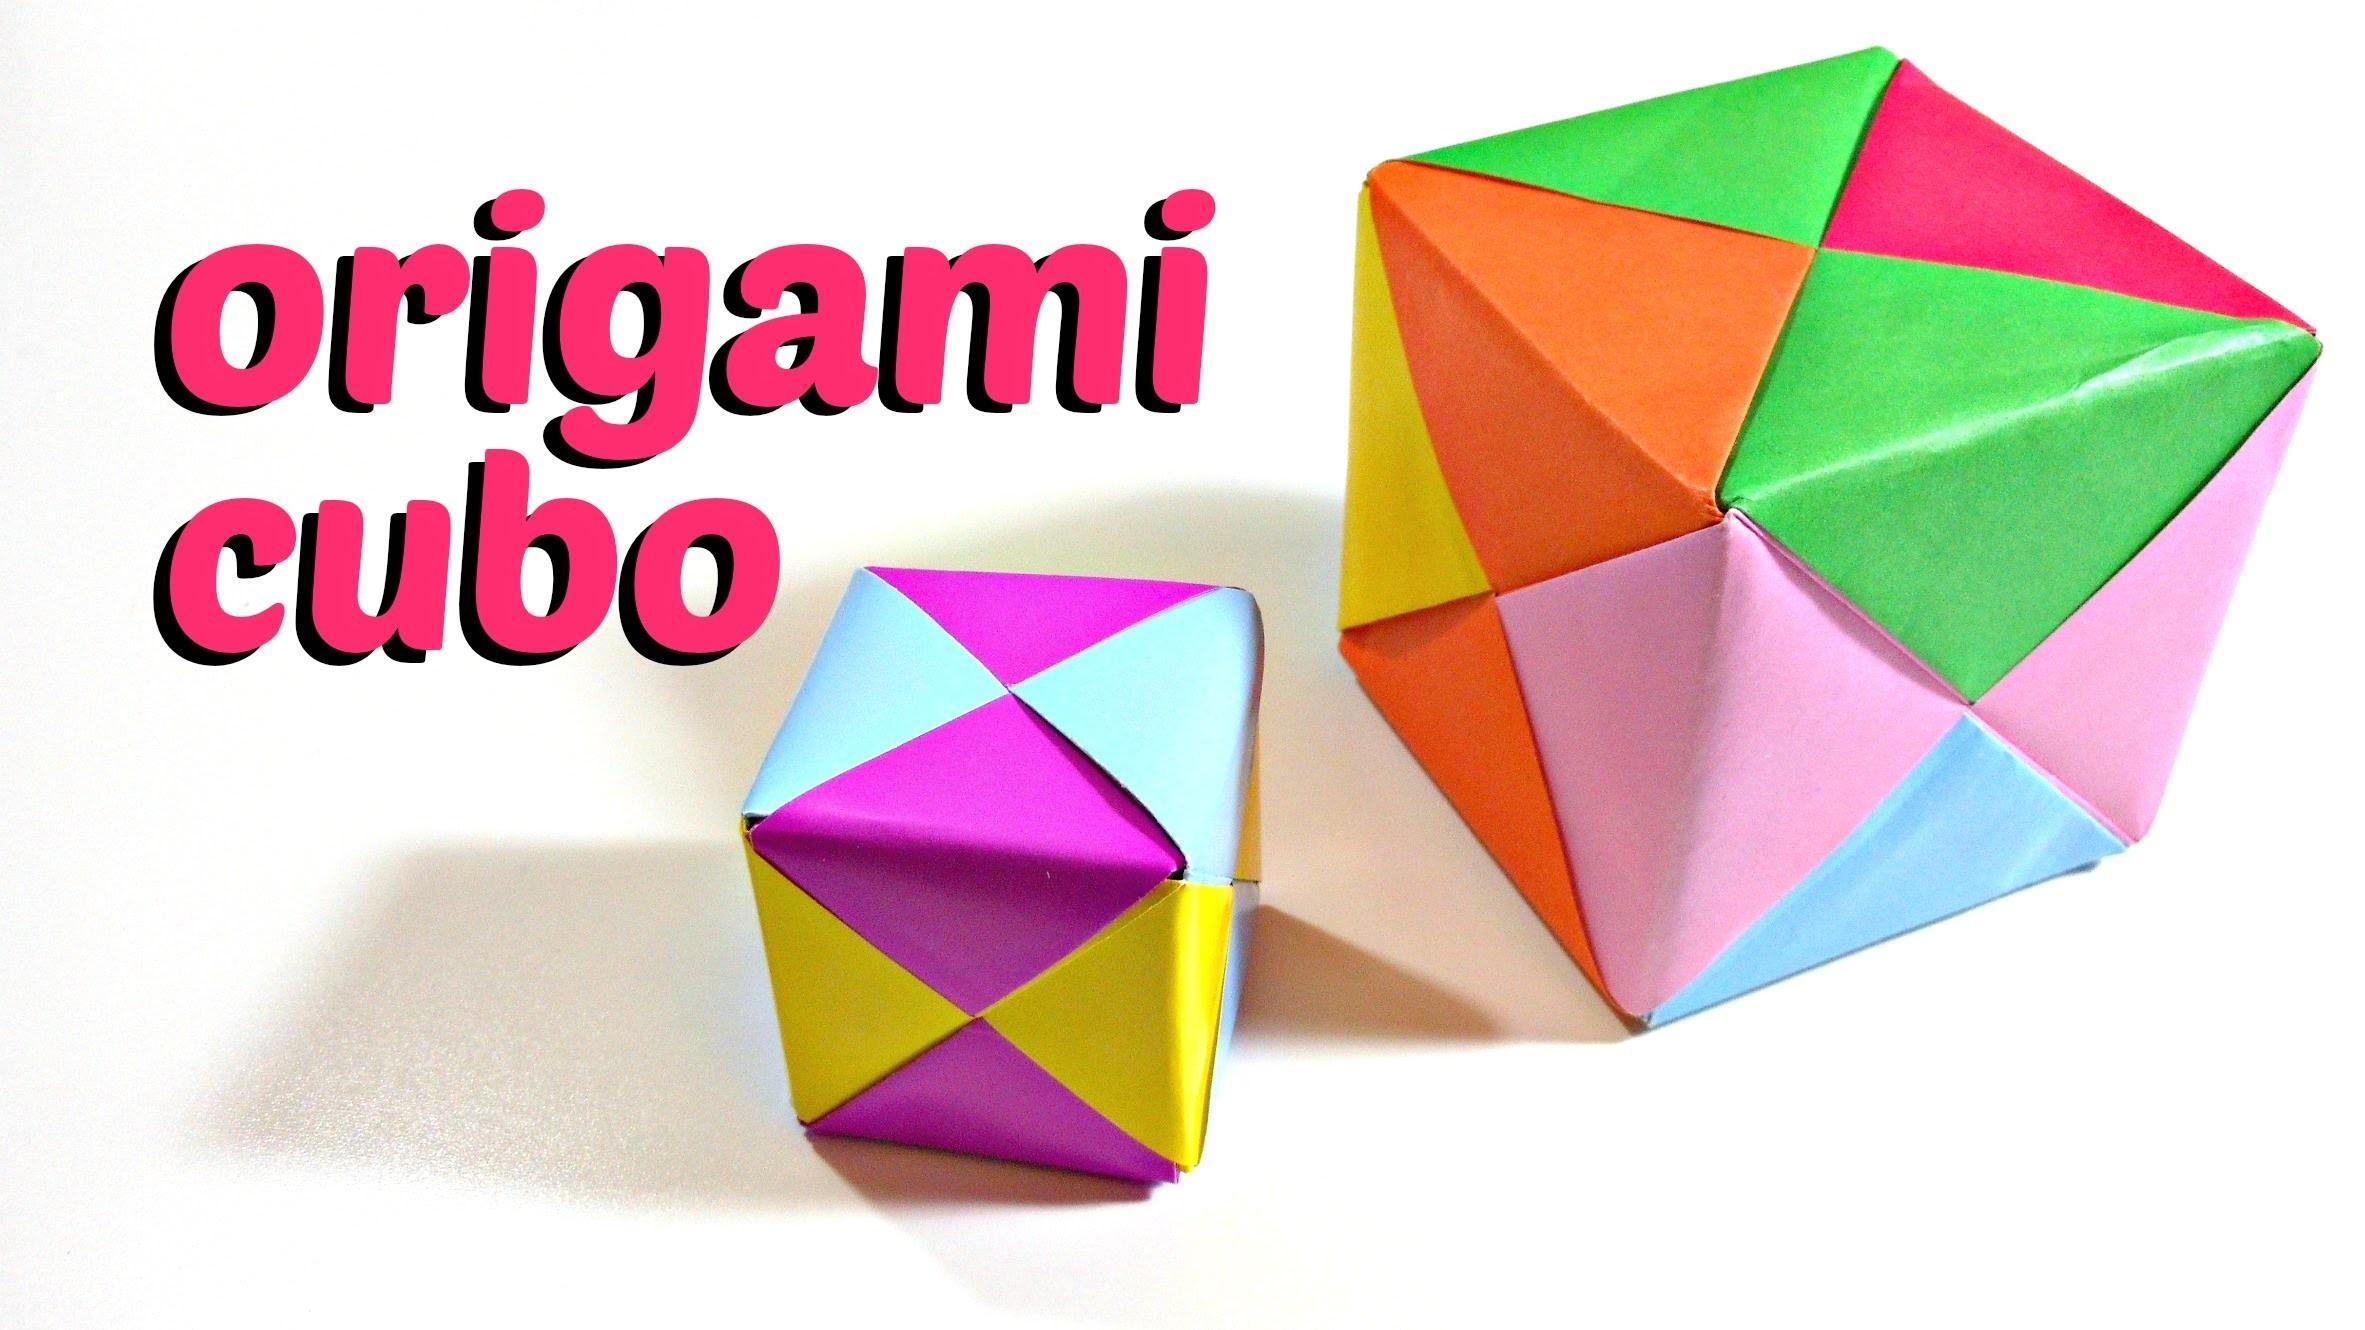 Cubo de Origami - Origami cube | Mundo@Party